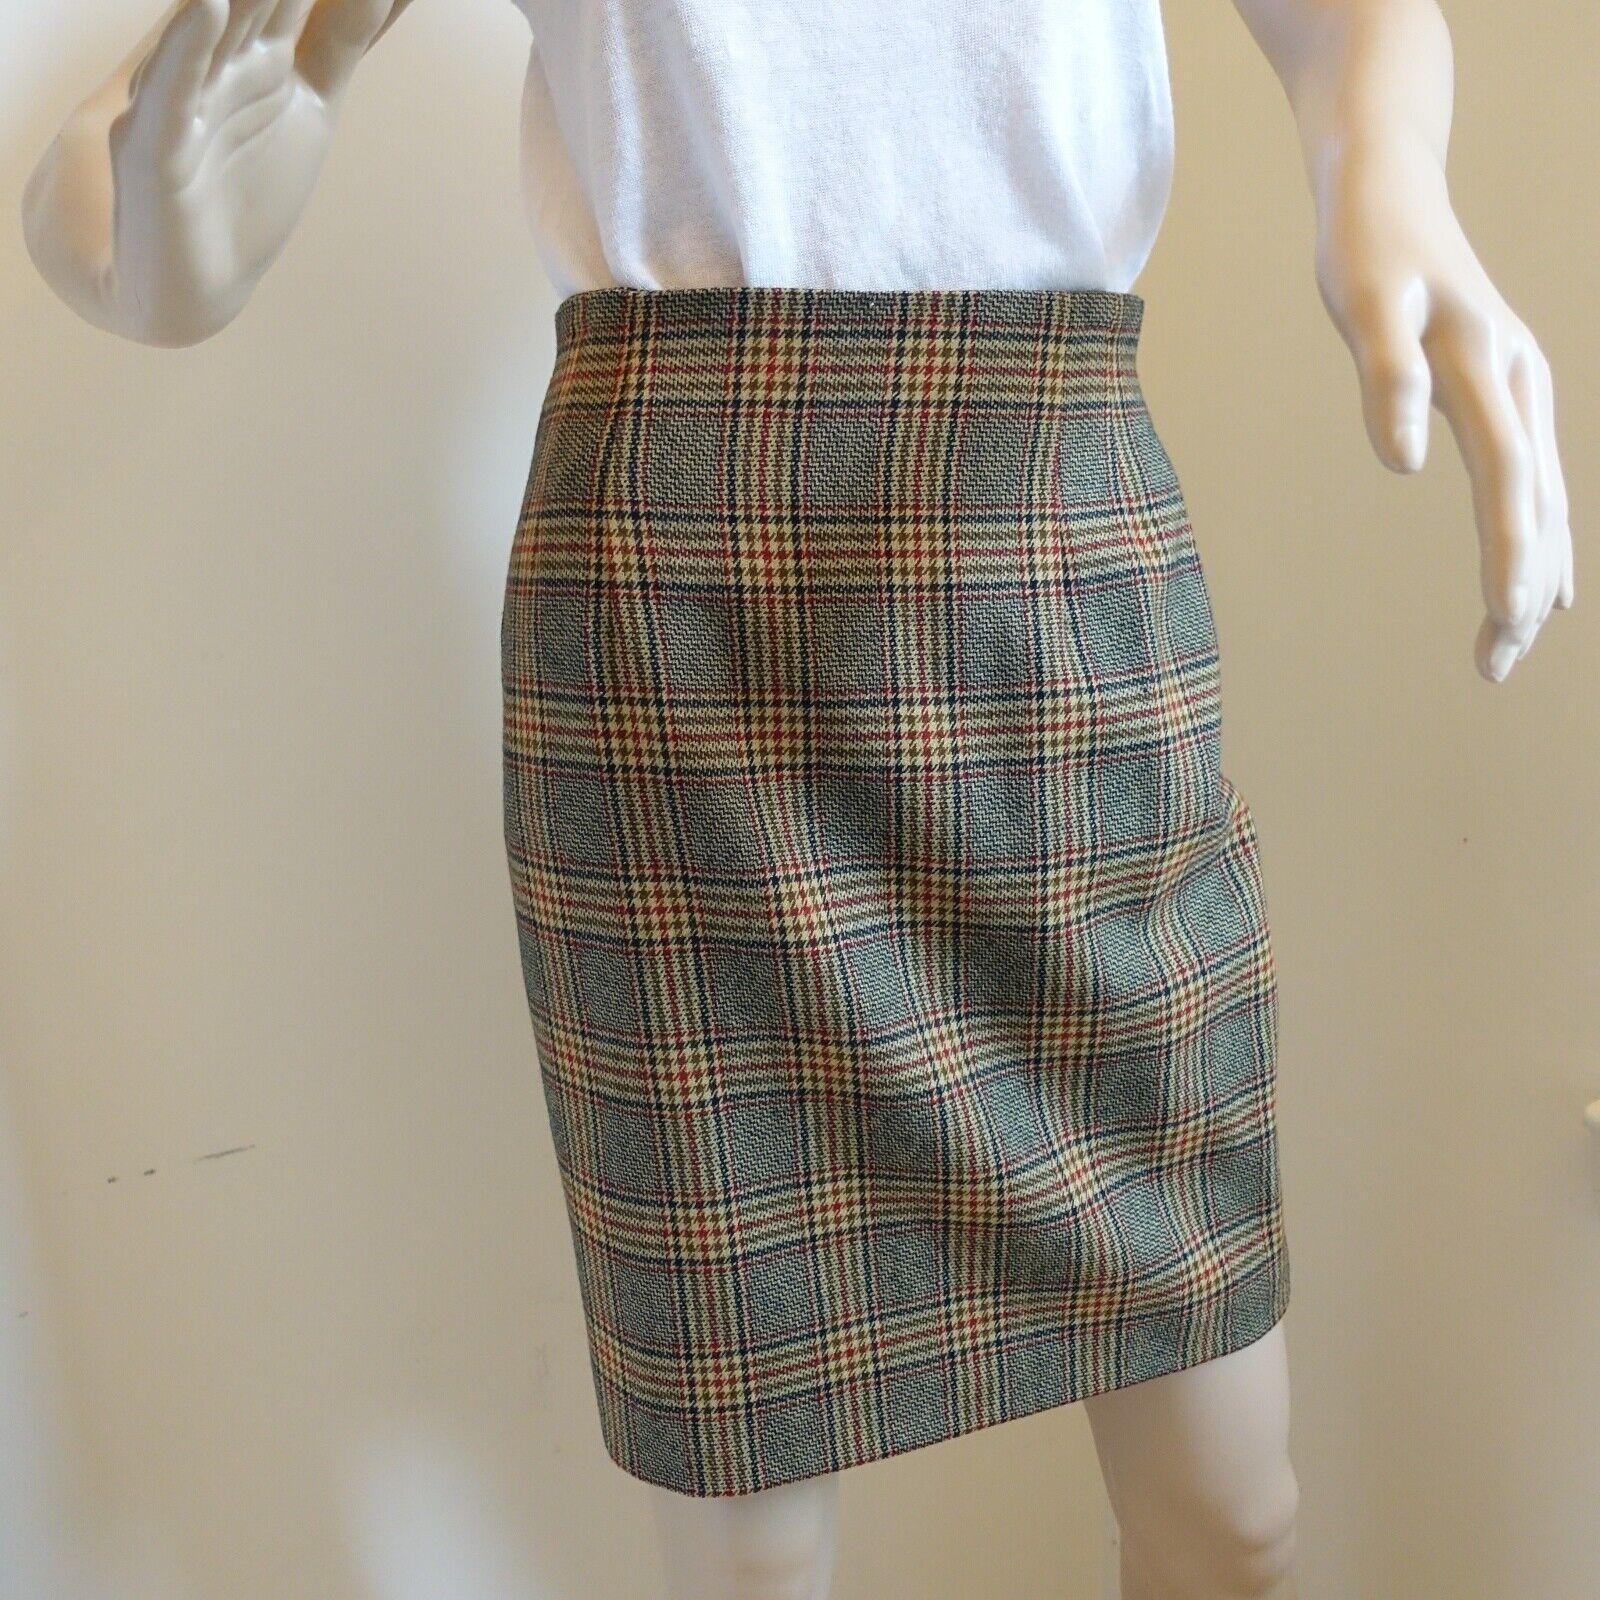 Jones New York Petite A-Line 100% Wool Houndstooth Plaid Skirt Sz 6P